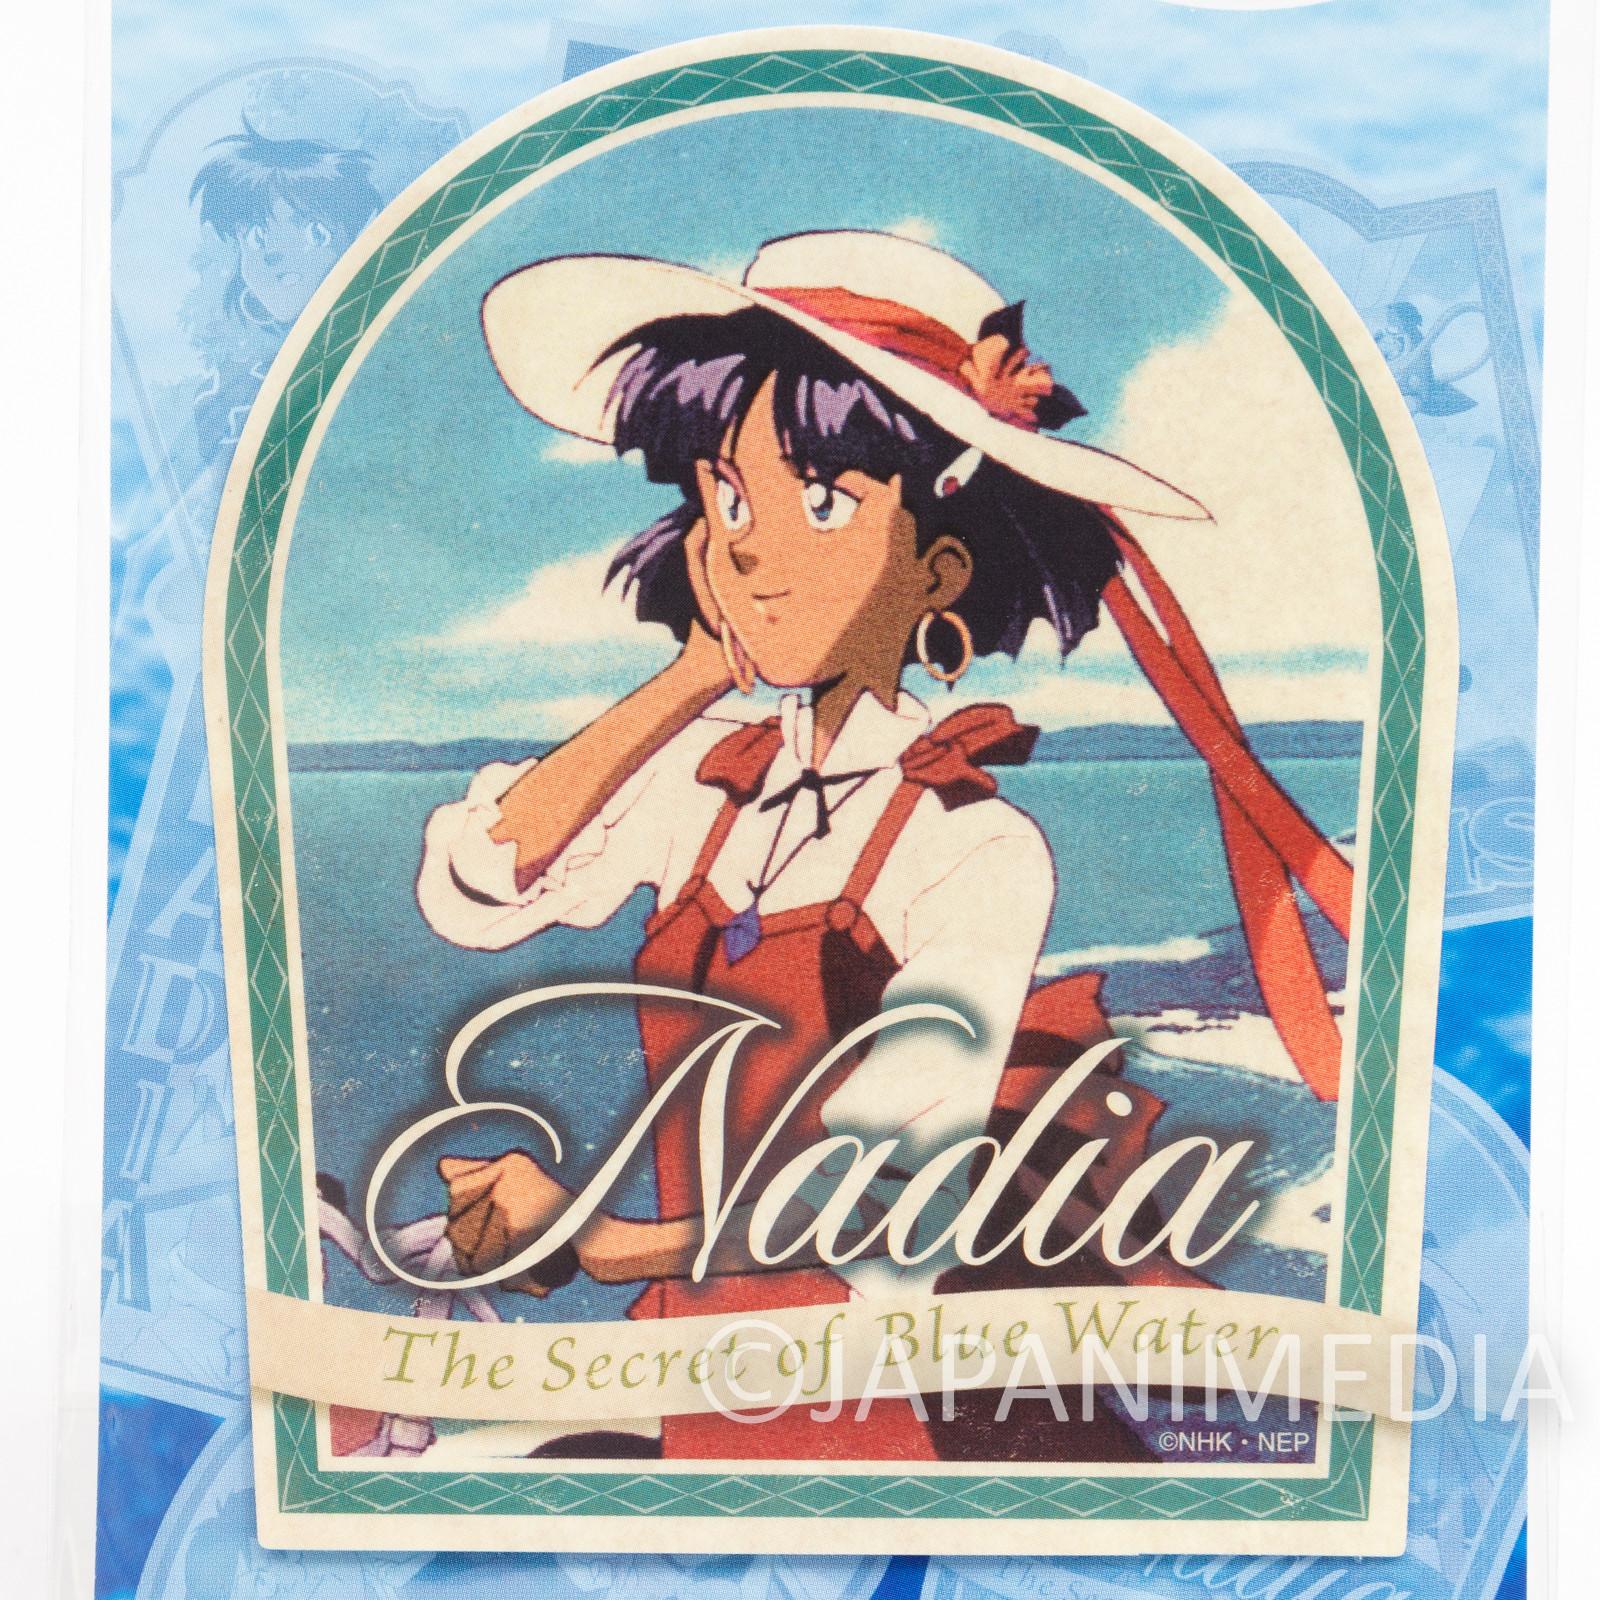 Nadia The Secret of Blue Water Travel Sticker#1 ANIME GAINAX